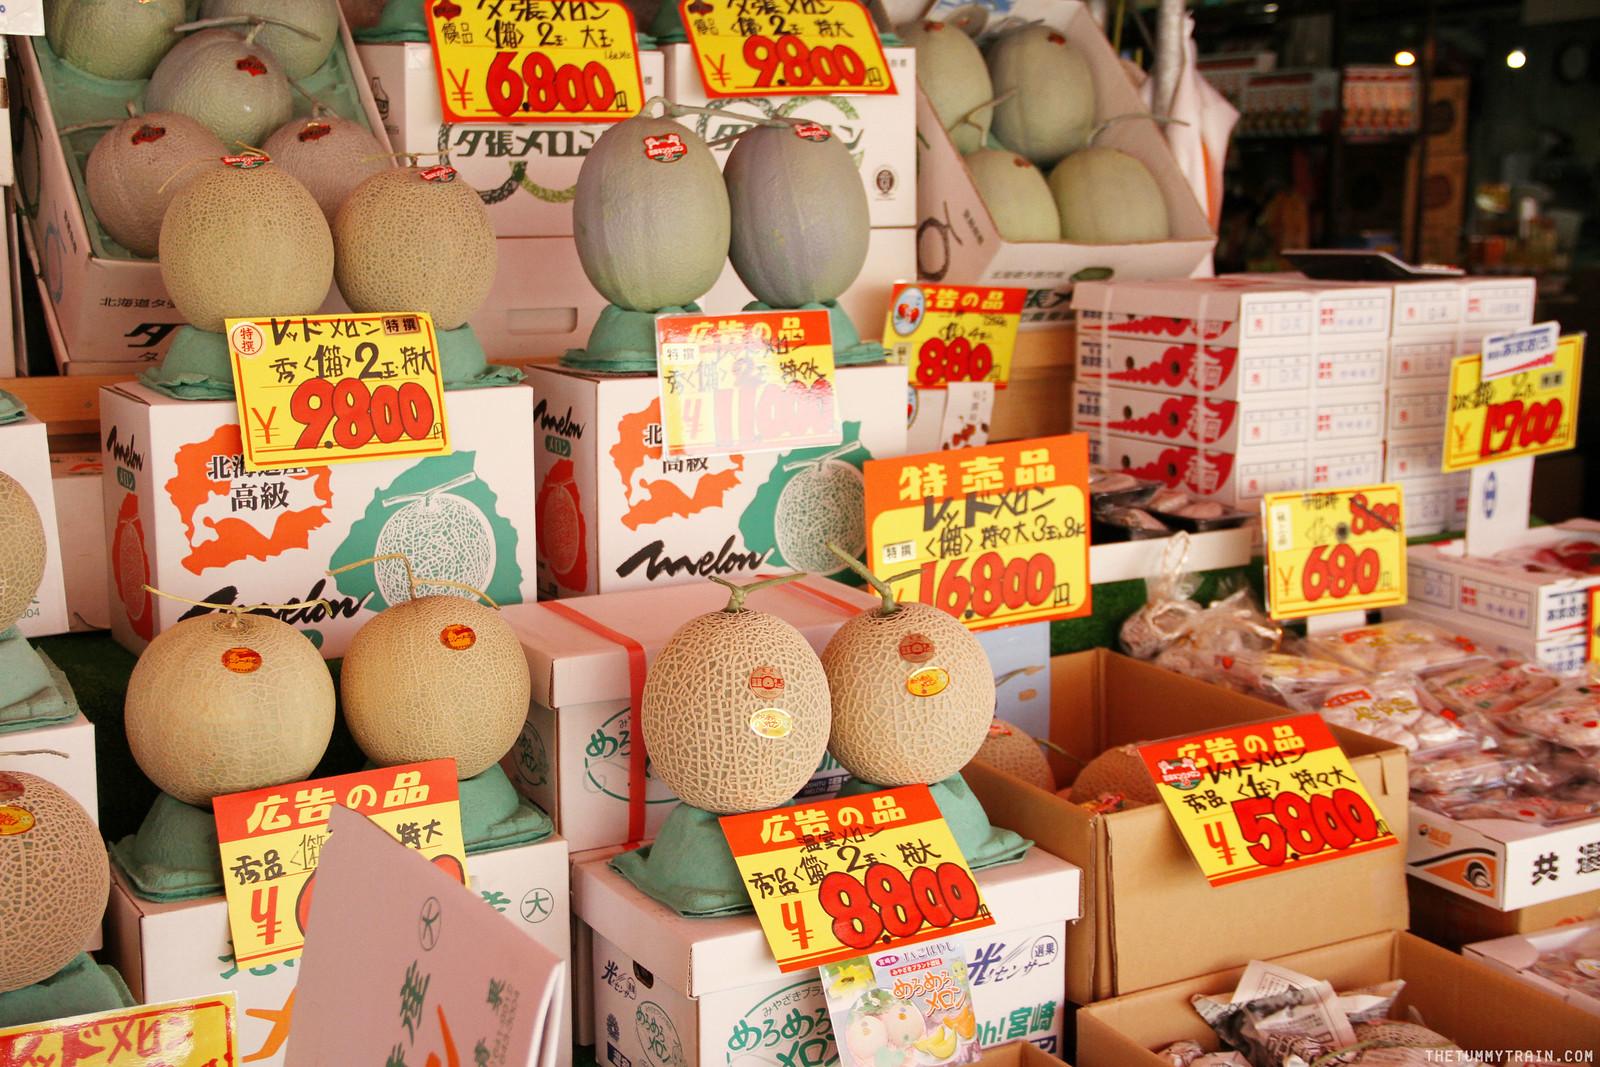 32590577110 6eb9f6dd55 h - Sapporo Travel Diary 2017: A brief visit to the Sapporo Central Wholesale Market